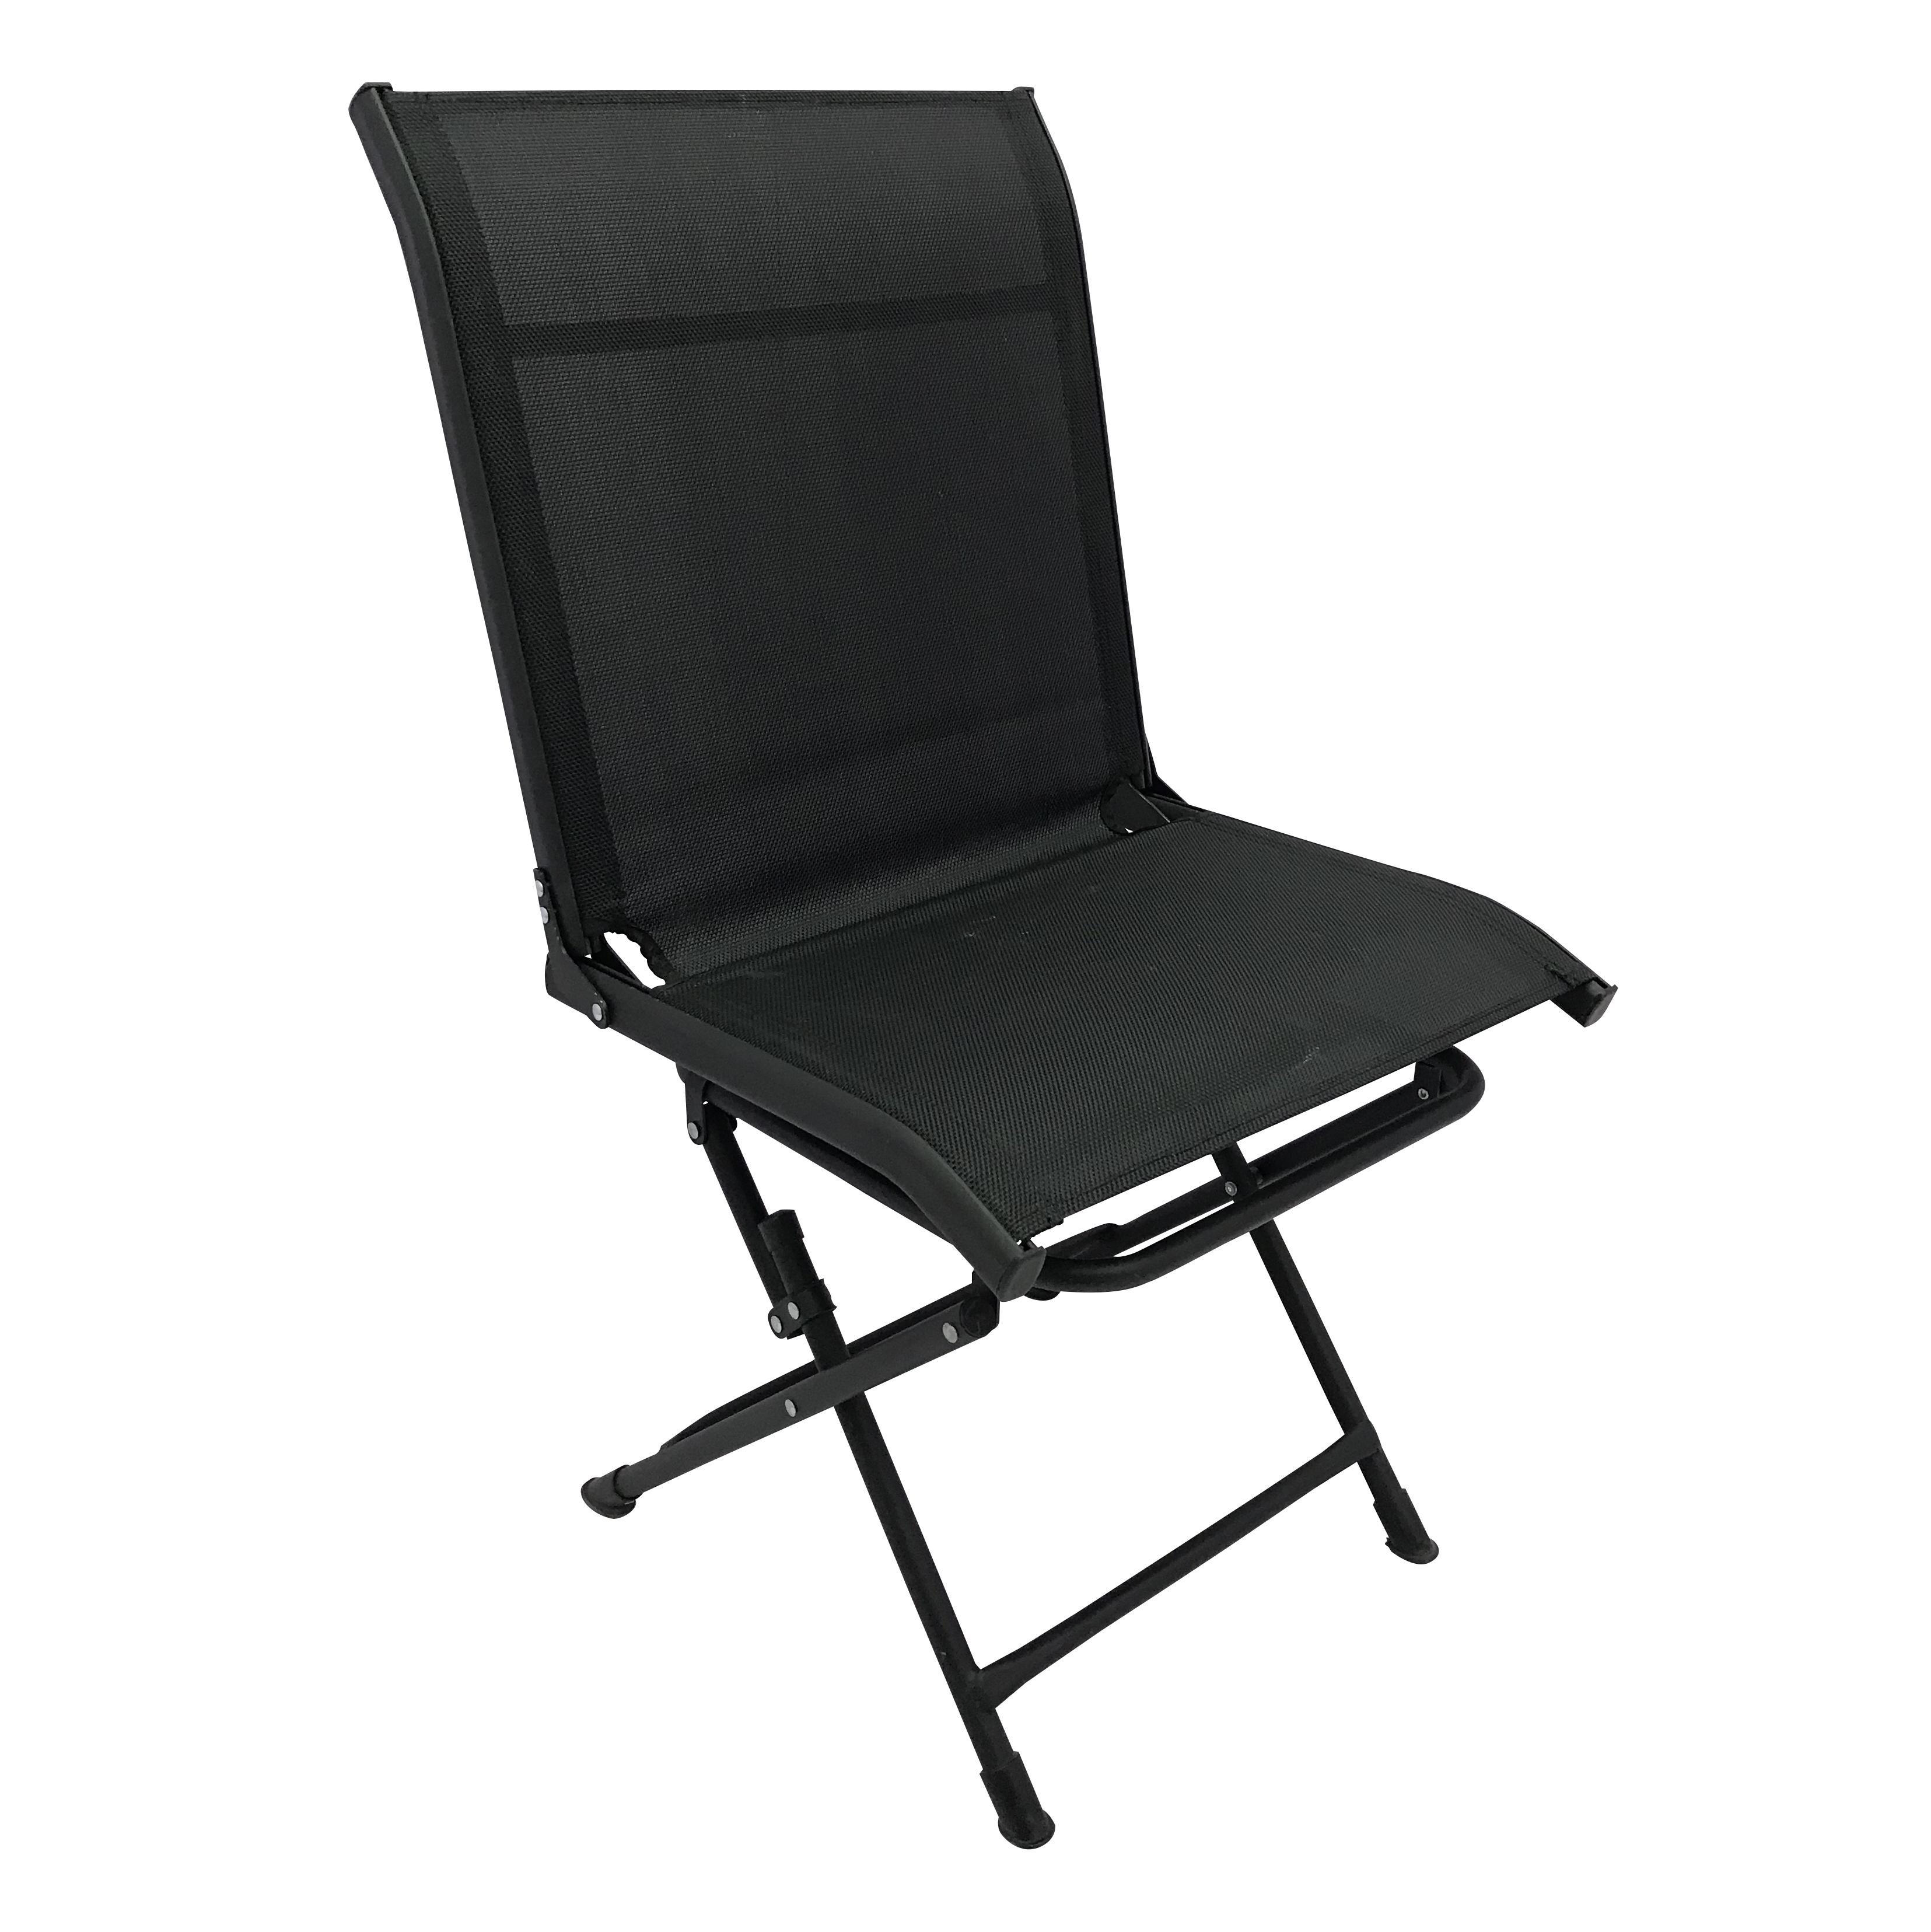 Sportsman 365 Swivel Blind Chair